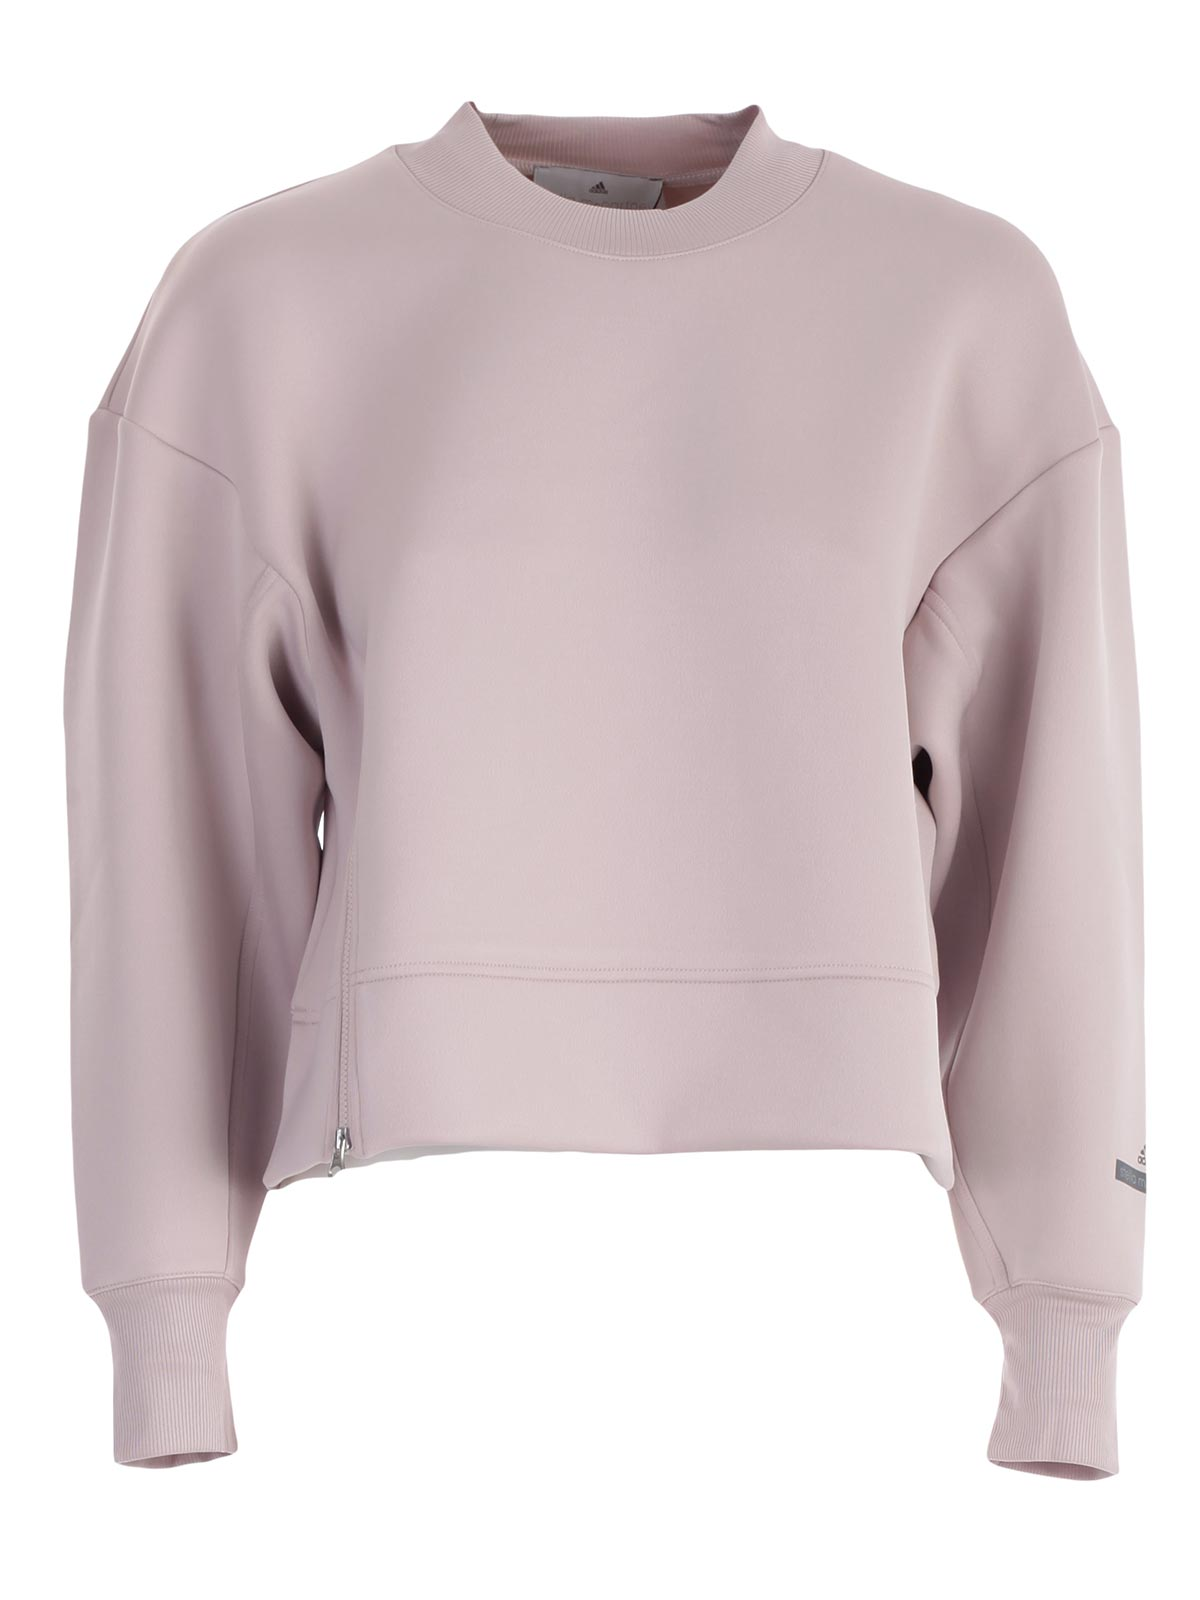 Sweatshirt Rose New Stella By S97529 Adidas Mccartney Smc K1TFlJc